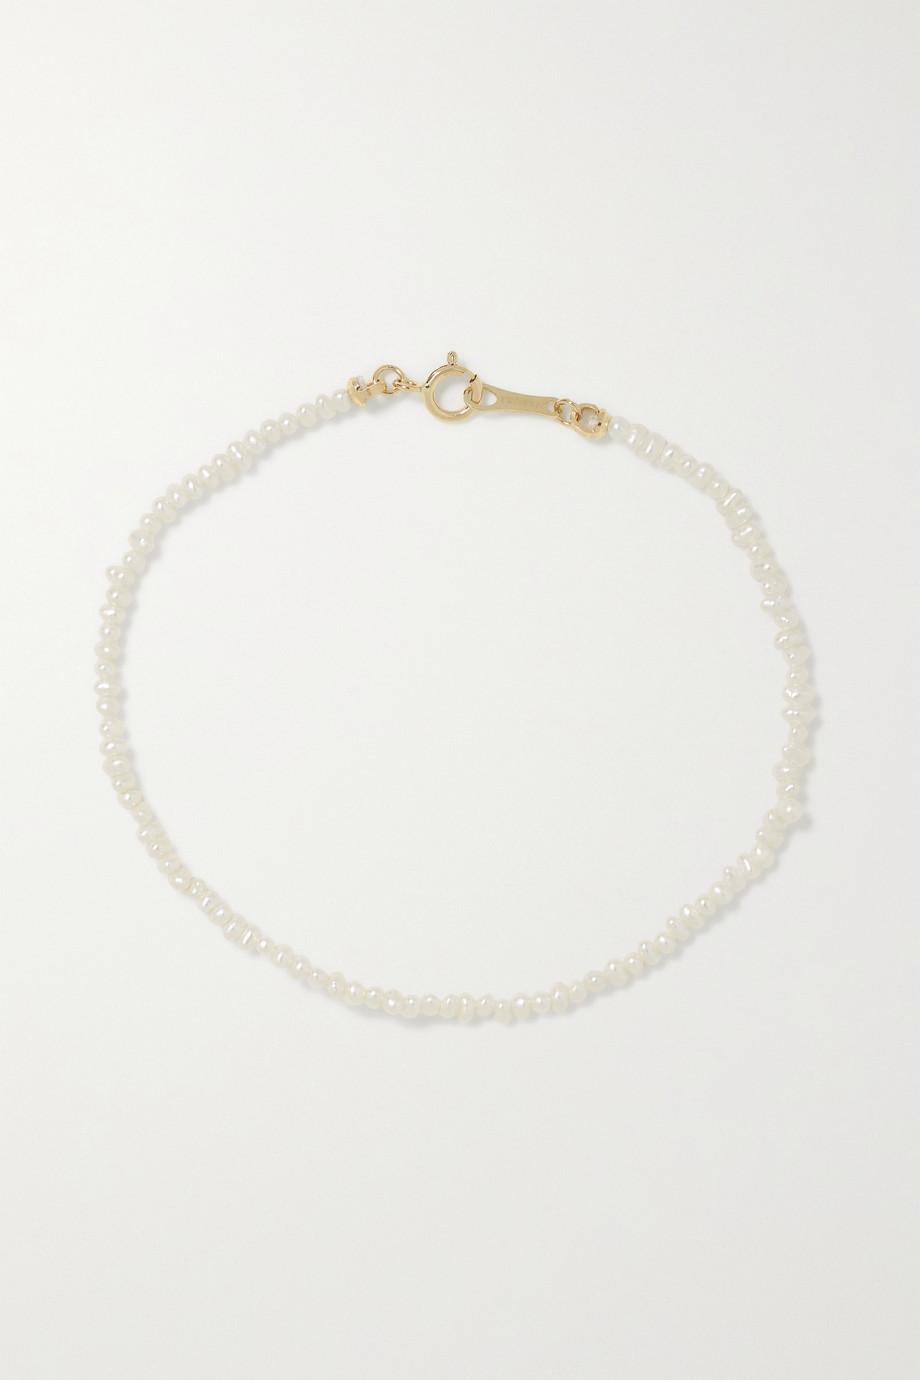 Mizuki Bracelet en or 14 carats (585/1000) et perles